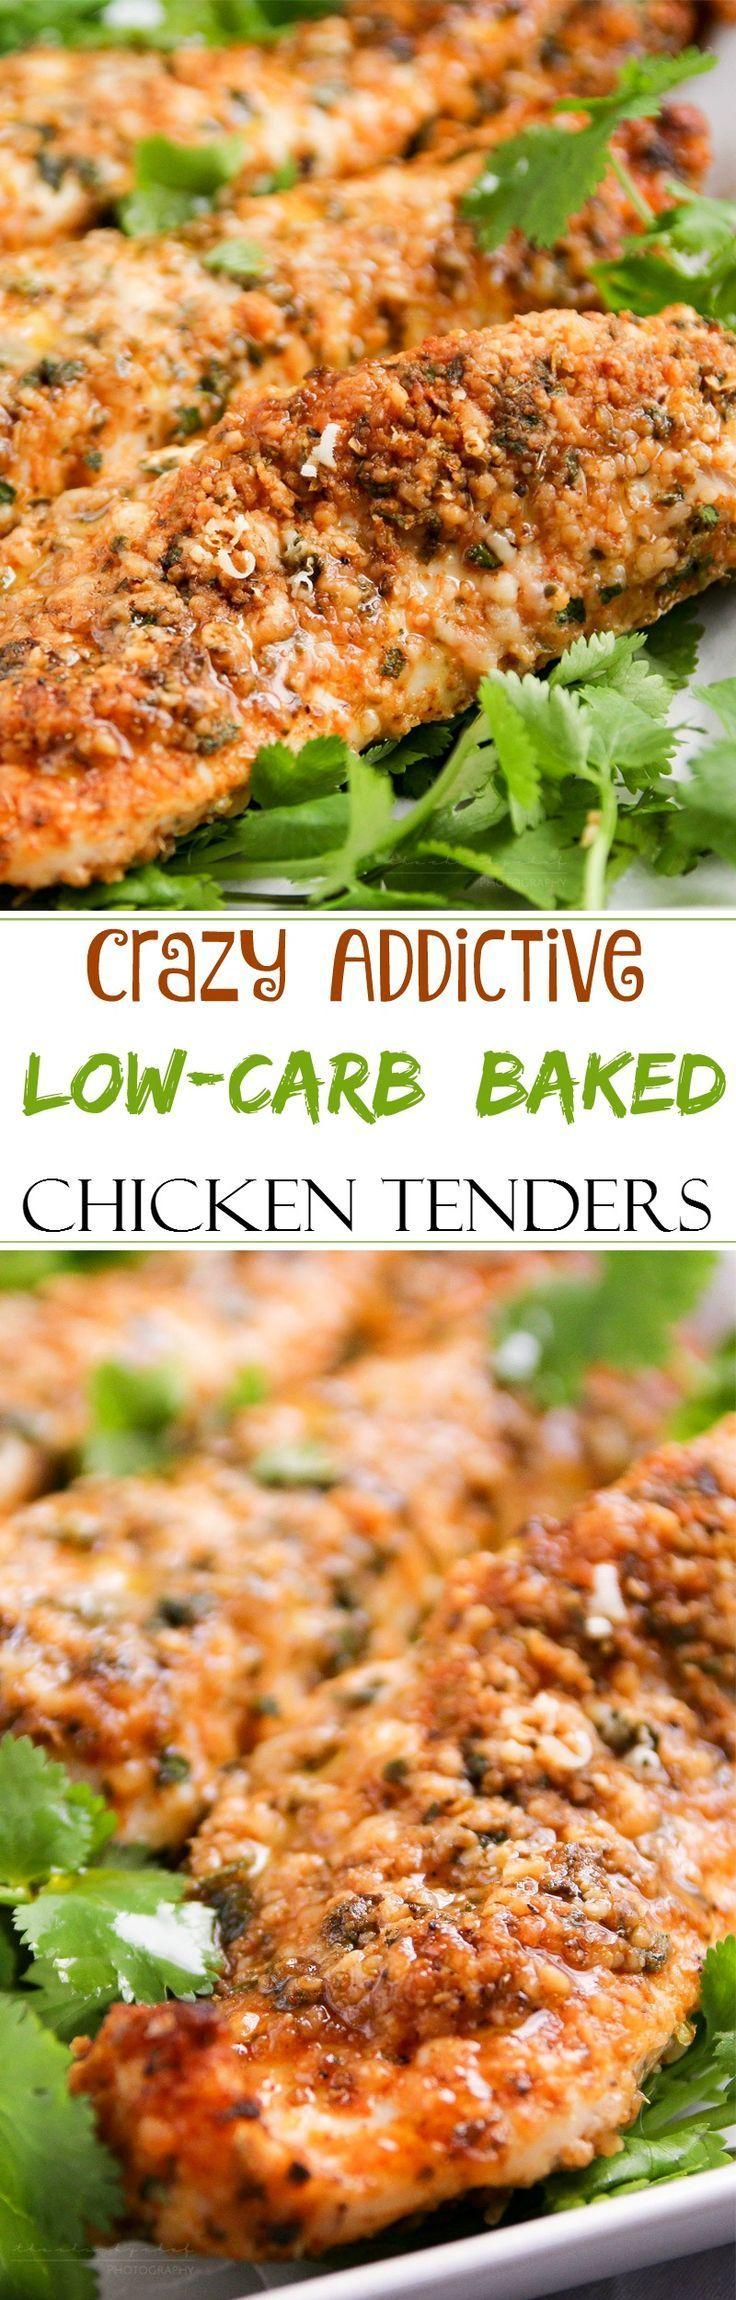 recipe: how long to bake chicken tenderloins at 375 [35]